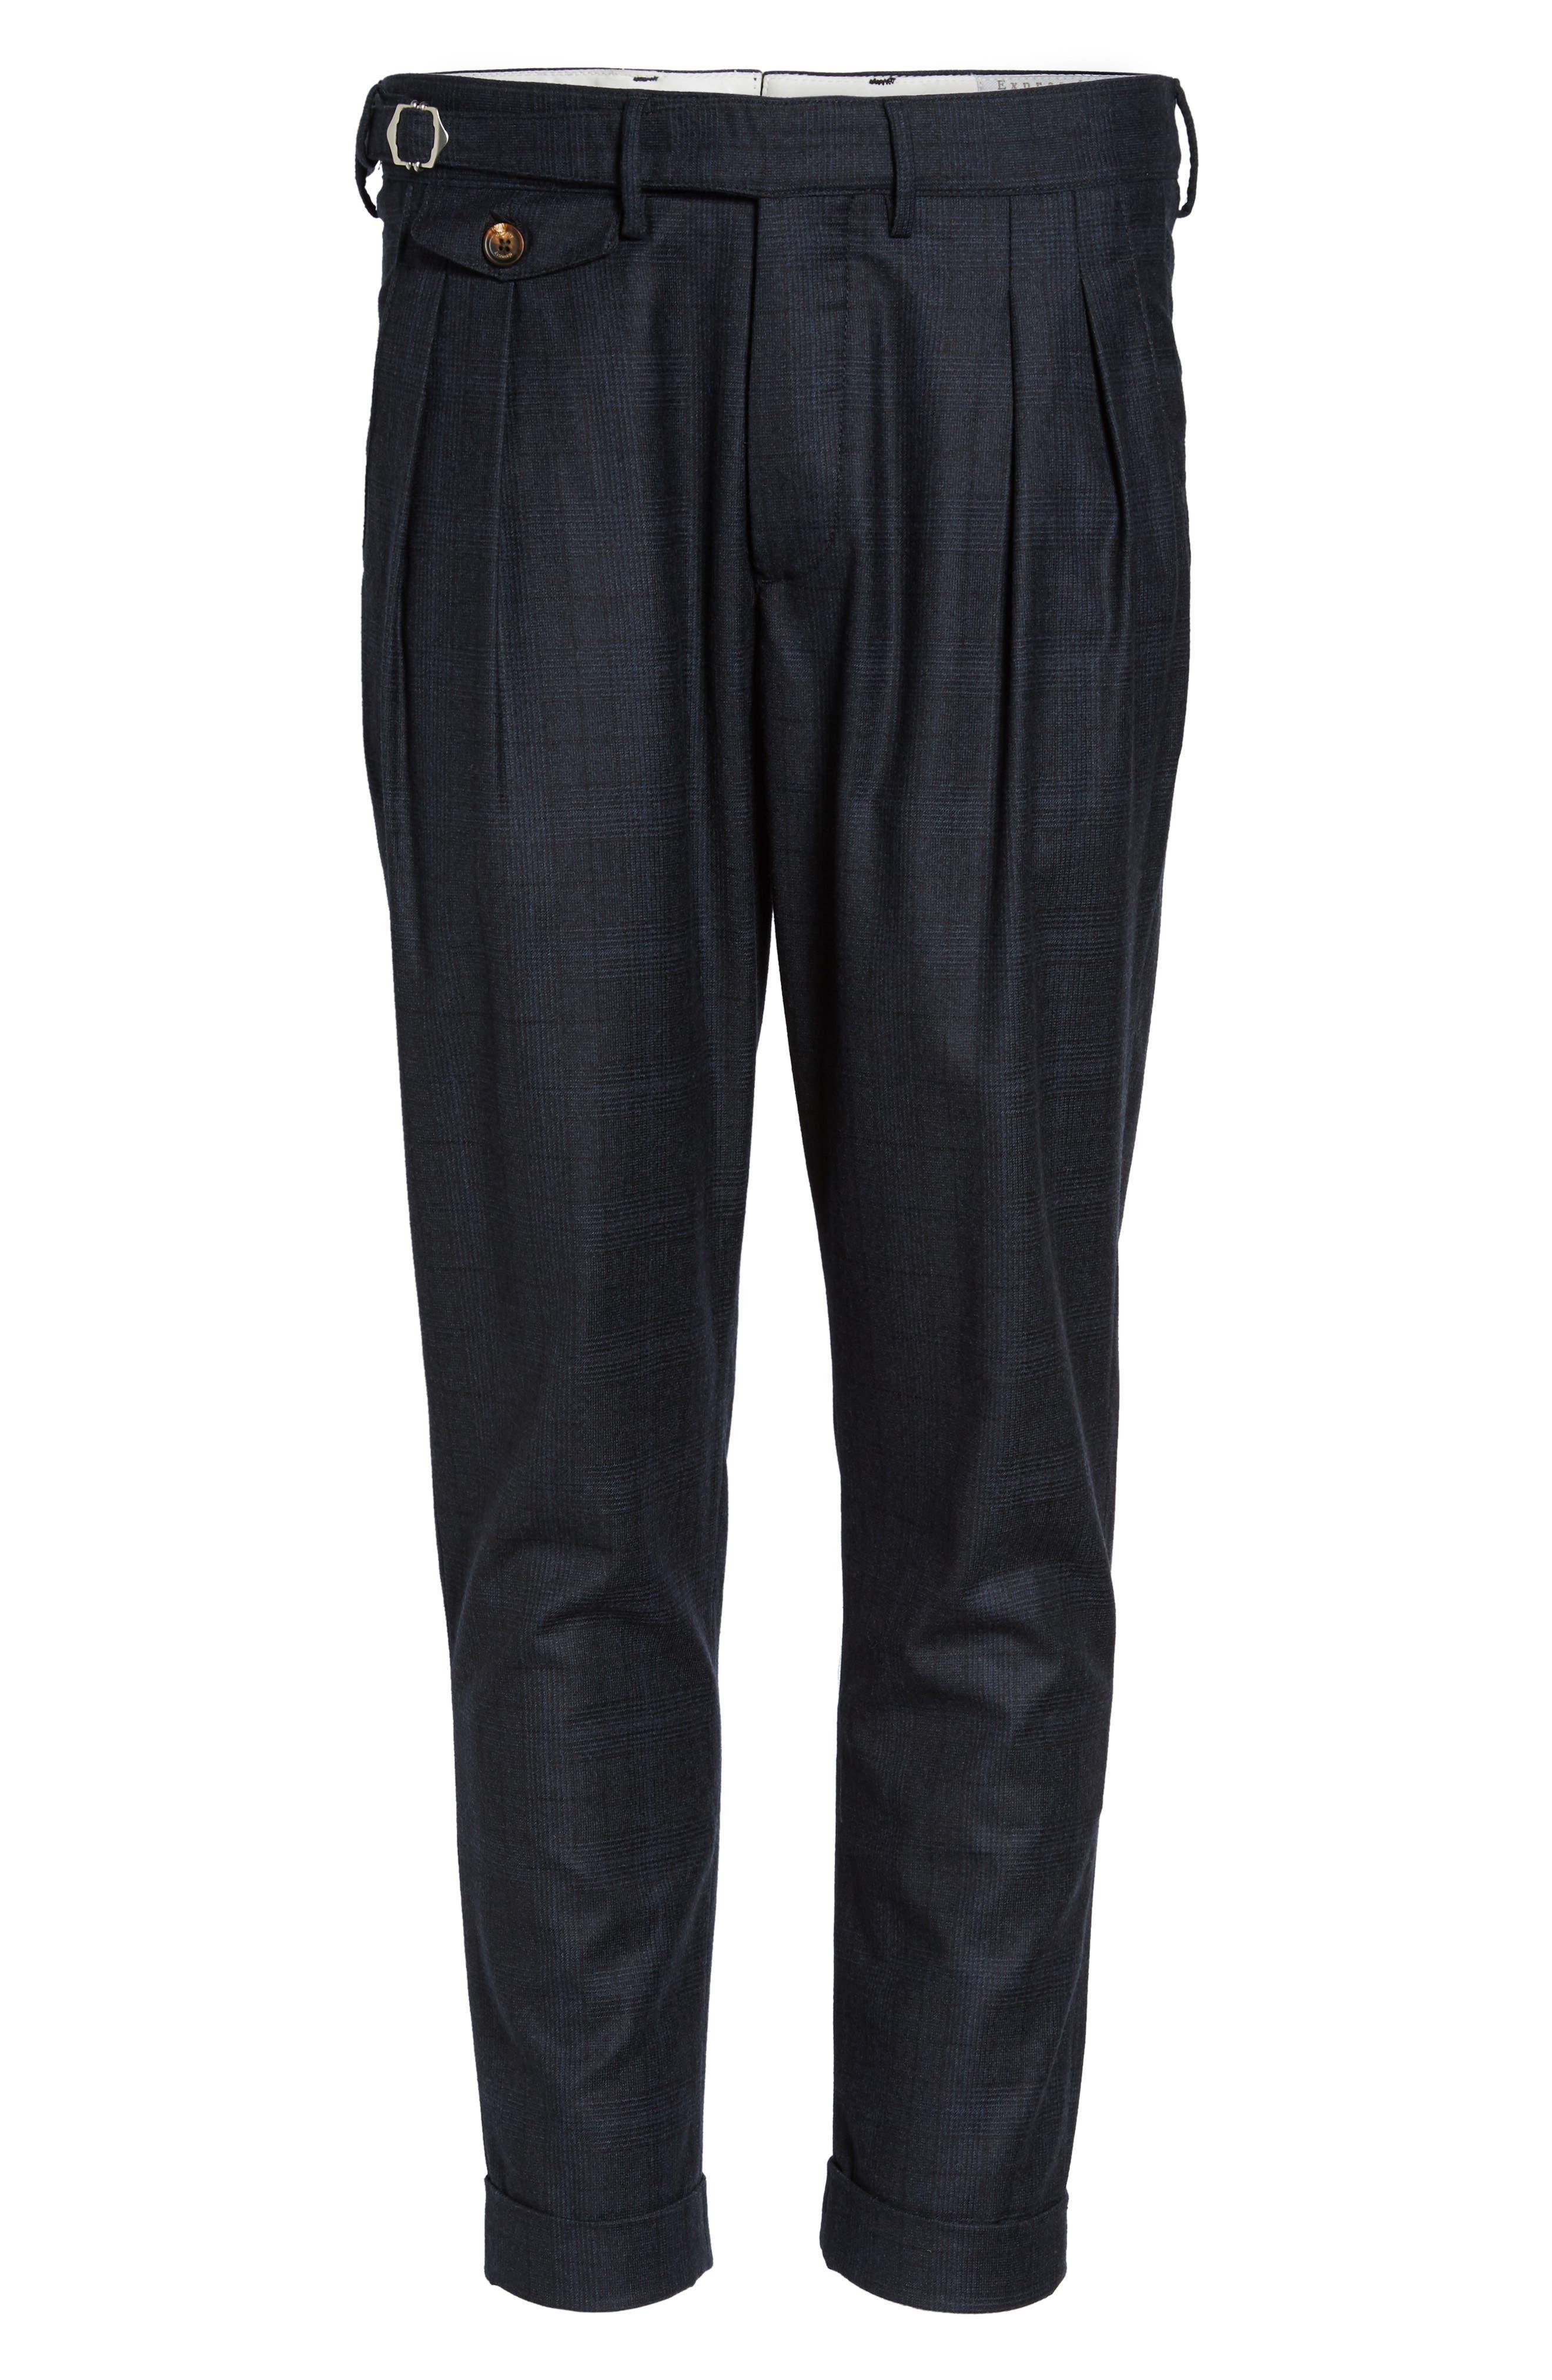 Glen Plaid Pleat Front Wool Pants,                             Alternate thumbnail 6, color,                             Navy